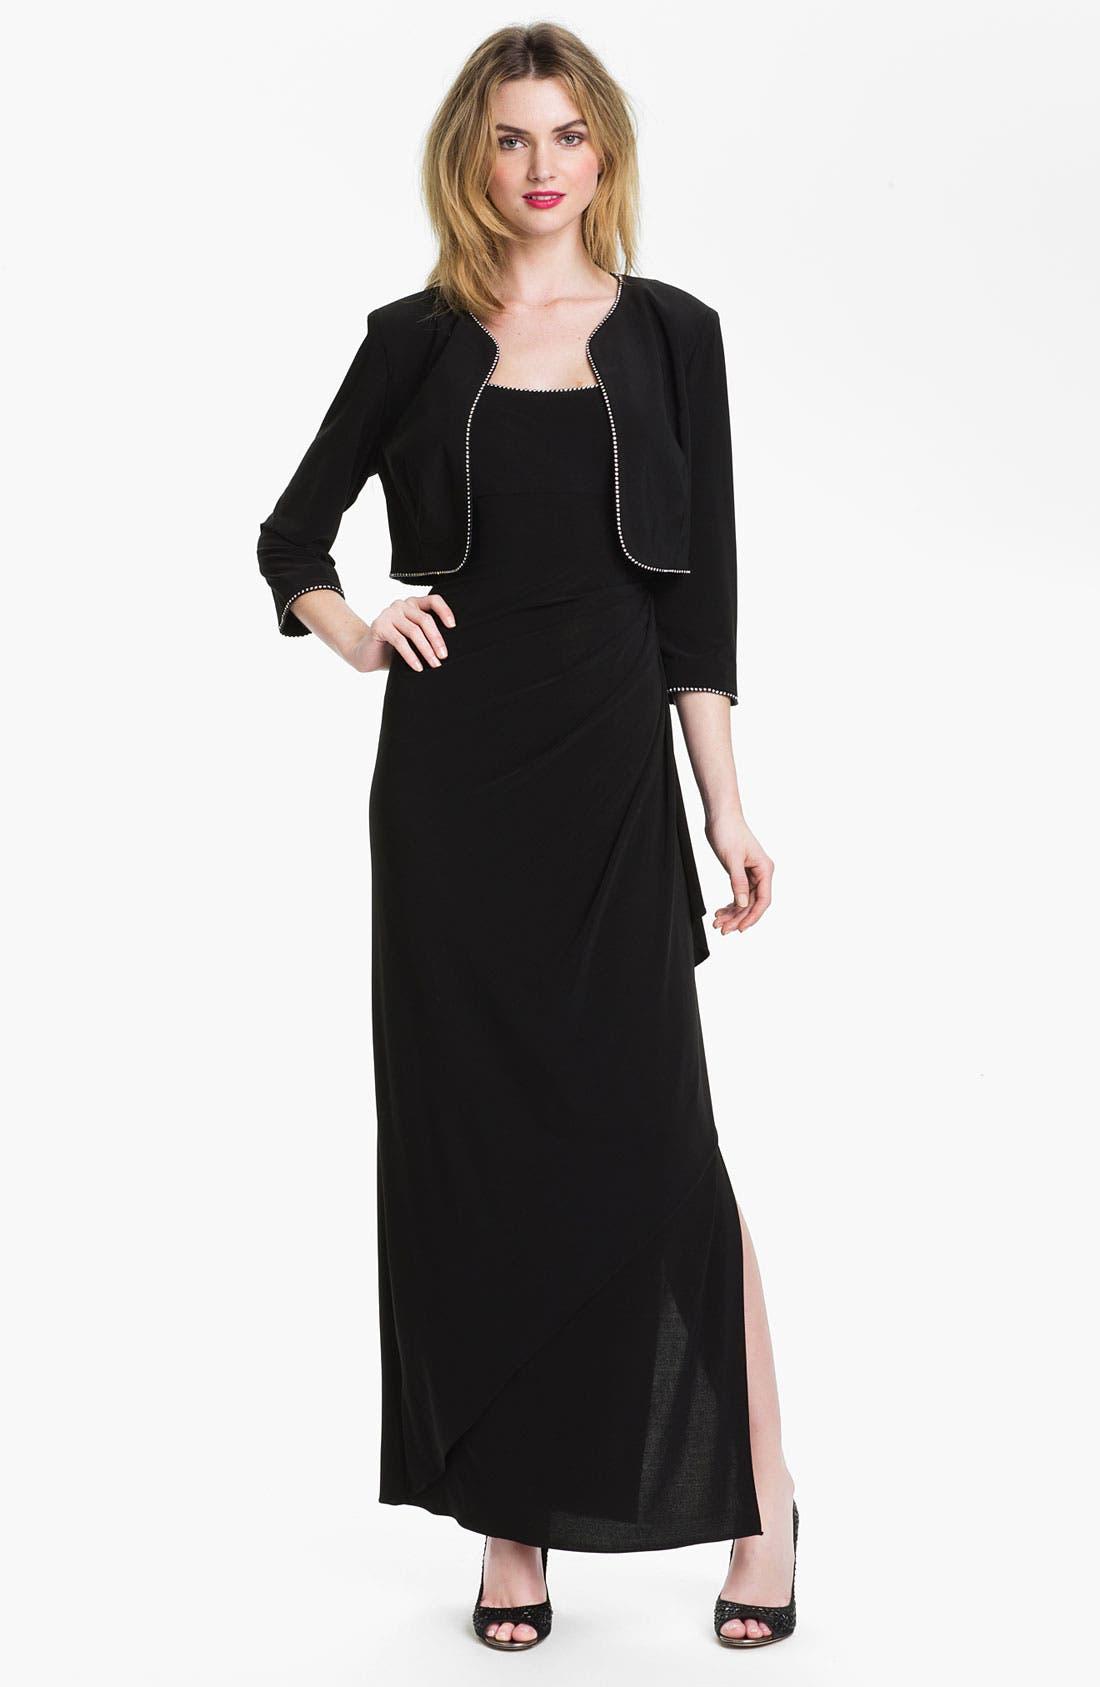 Alternate Image 1 Selected - Alex Evenings Rhinestone Trim Jersey Dress & Bolero